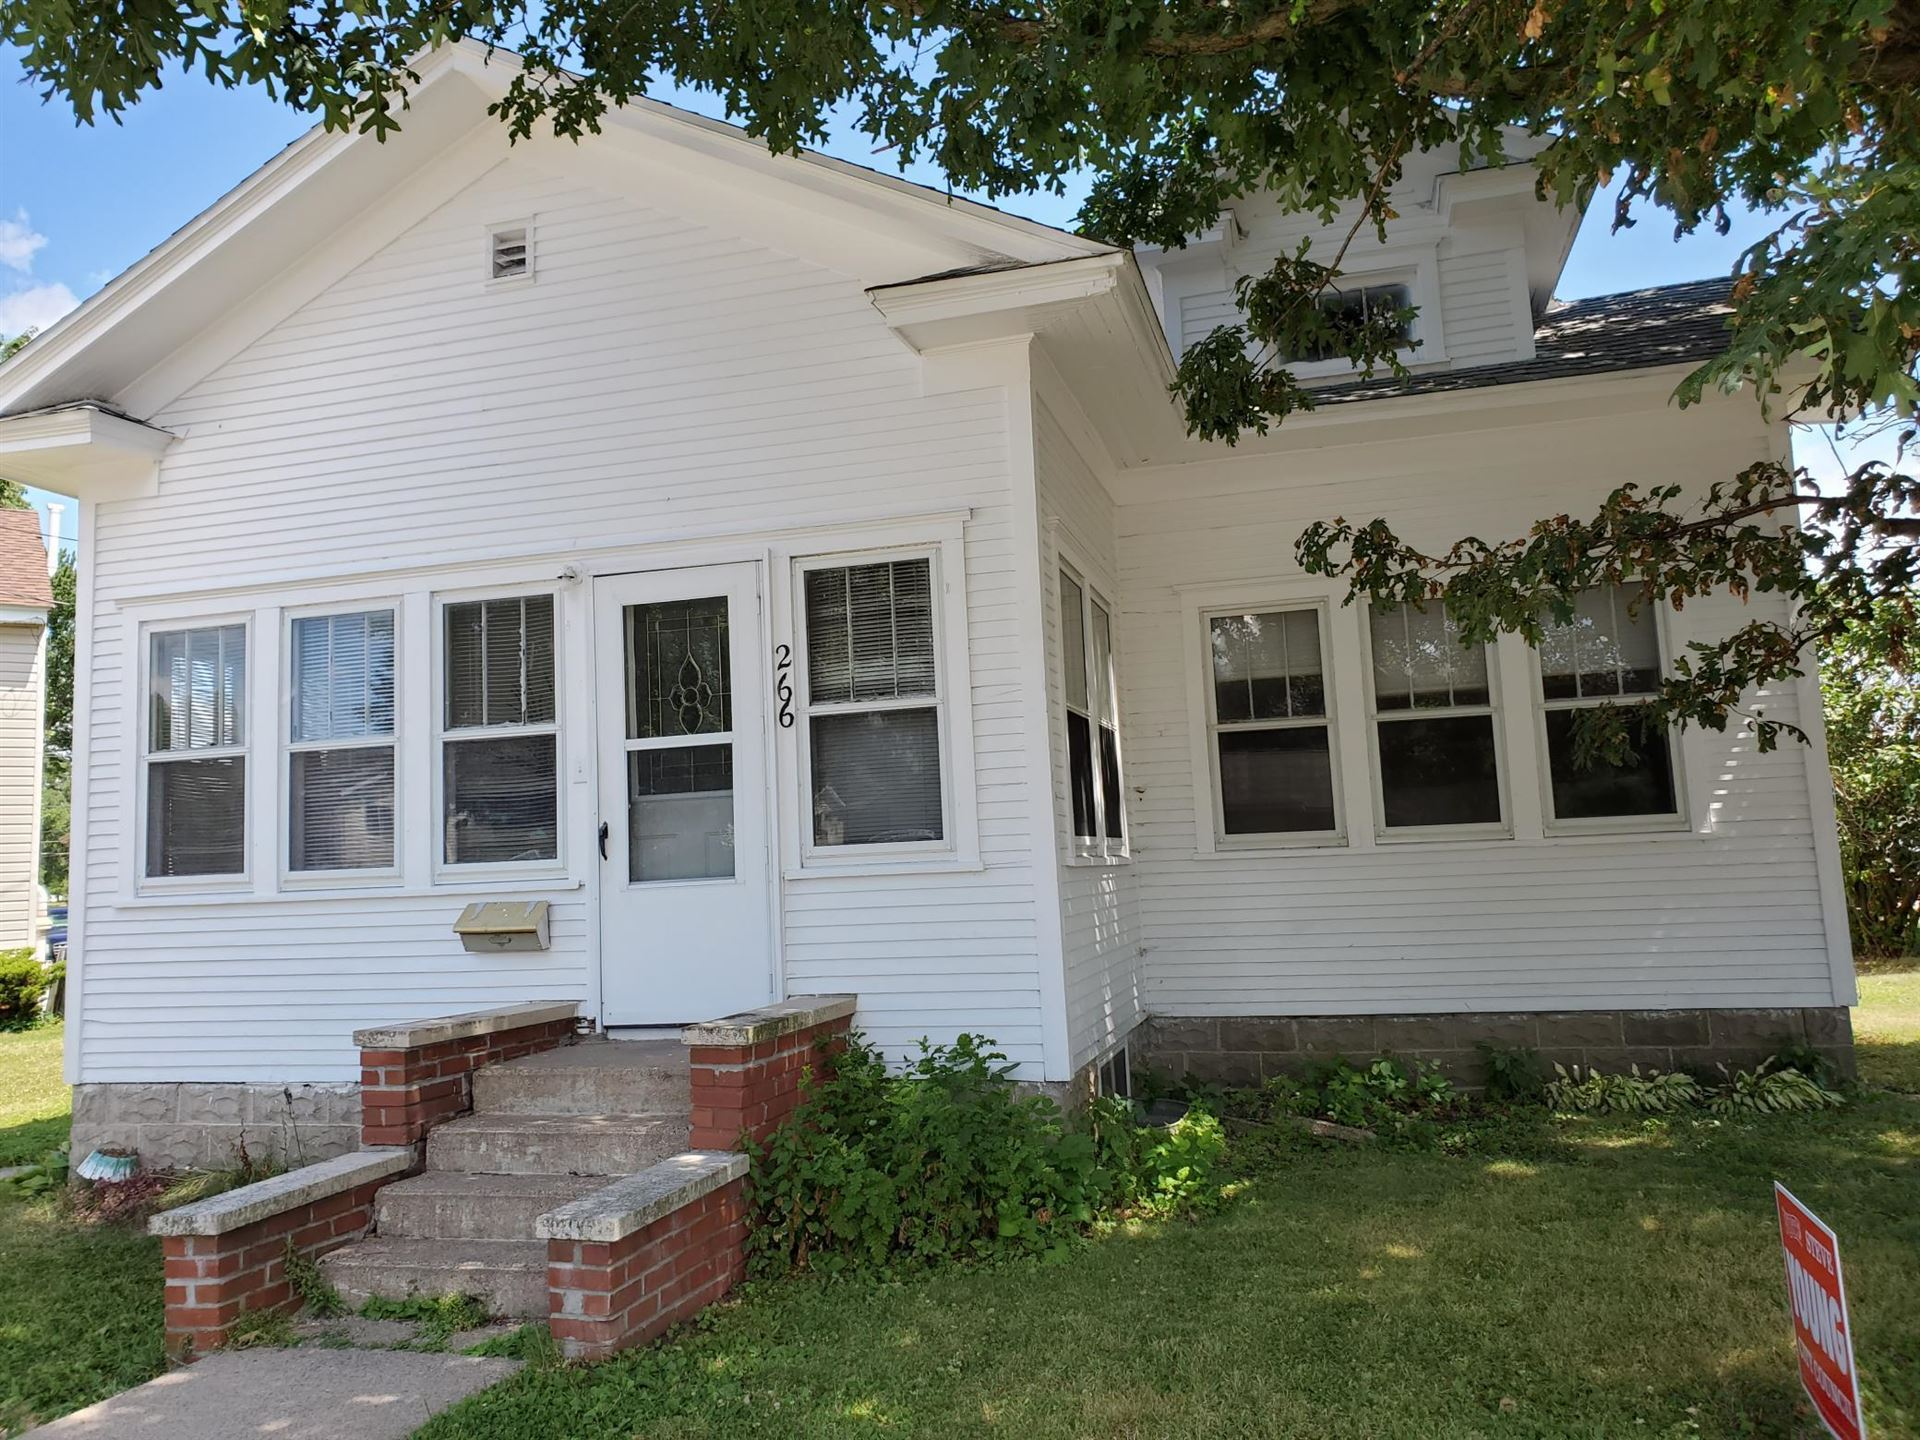 266 Orrin Street, Winona, MN 55987 - MLS#: 5634333